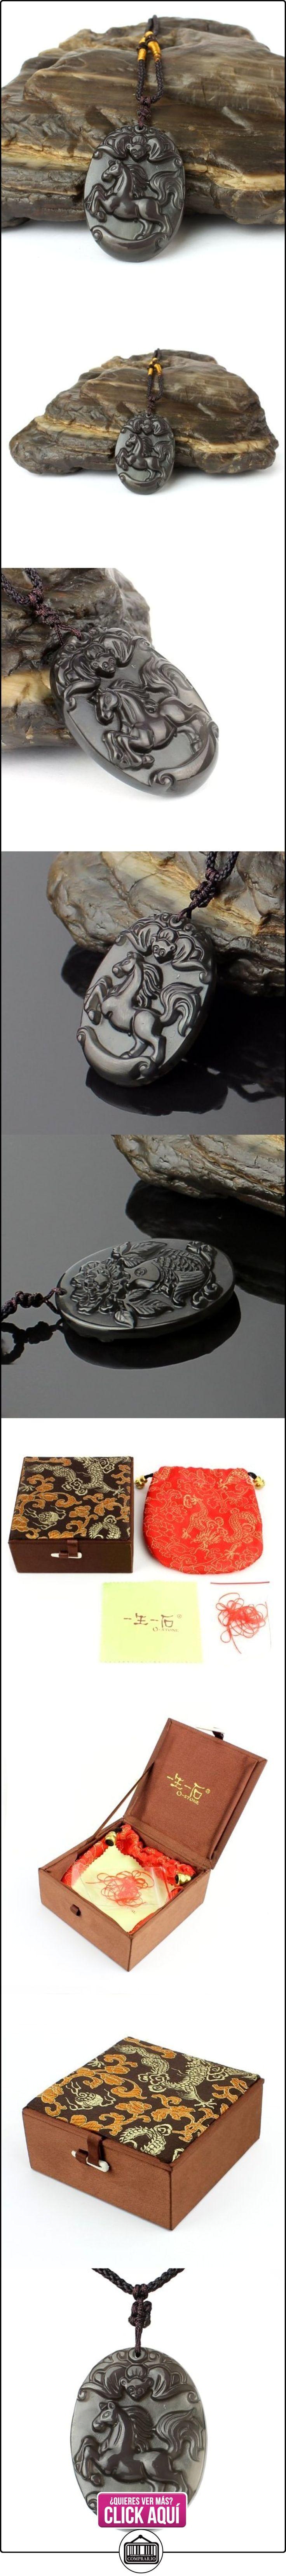 O-stone zodíaco chino serie colgante de obsidiana hielo negra ojo arco iris caballo 3A piedra protectora  ✿ Joyas para mujer - Las mejores ofertas ✿ ▬► Ver oferta: http://comprar.io/goto/B00BNUHALI